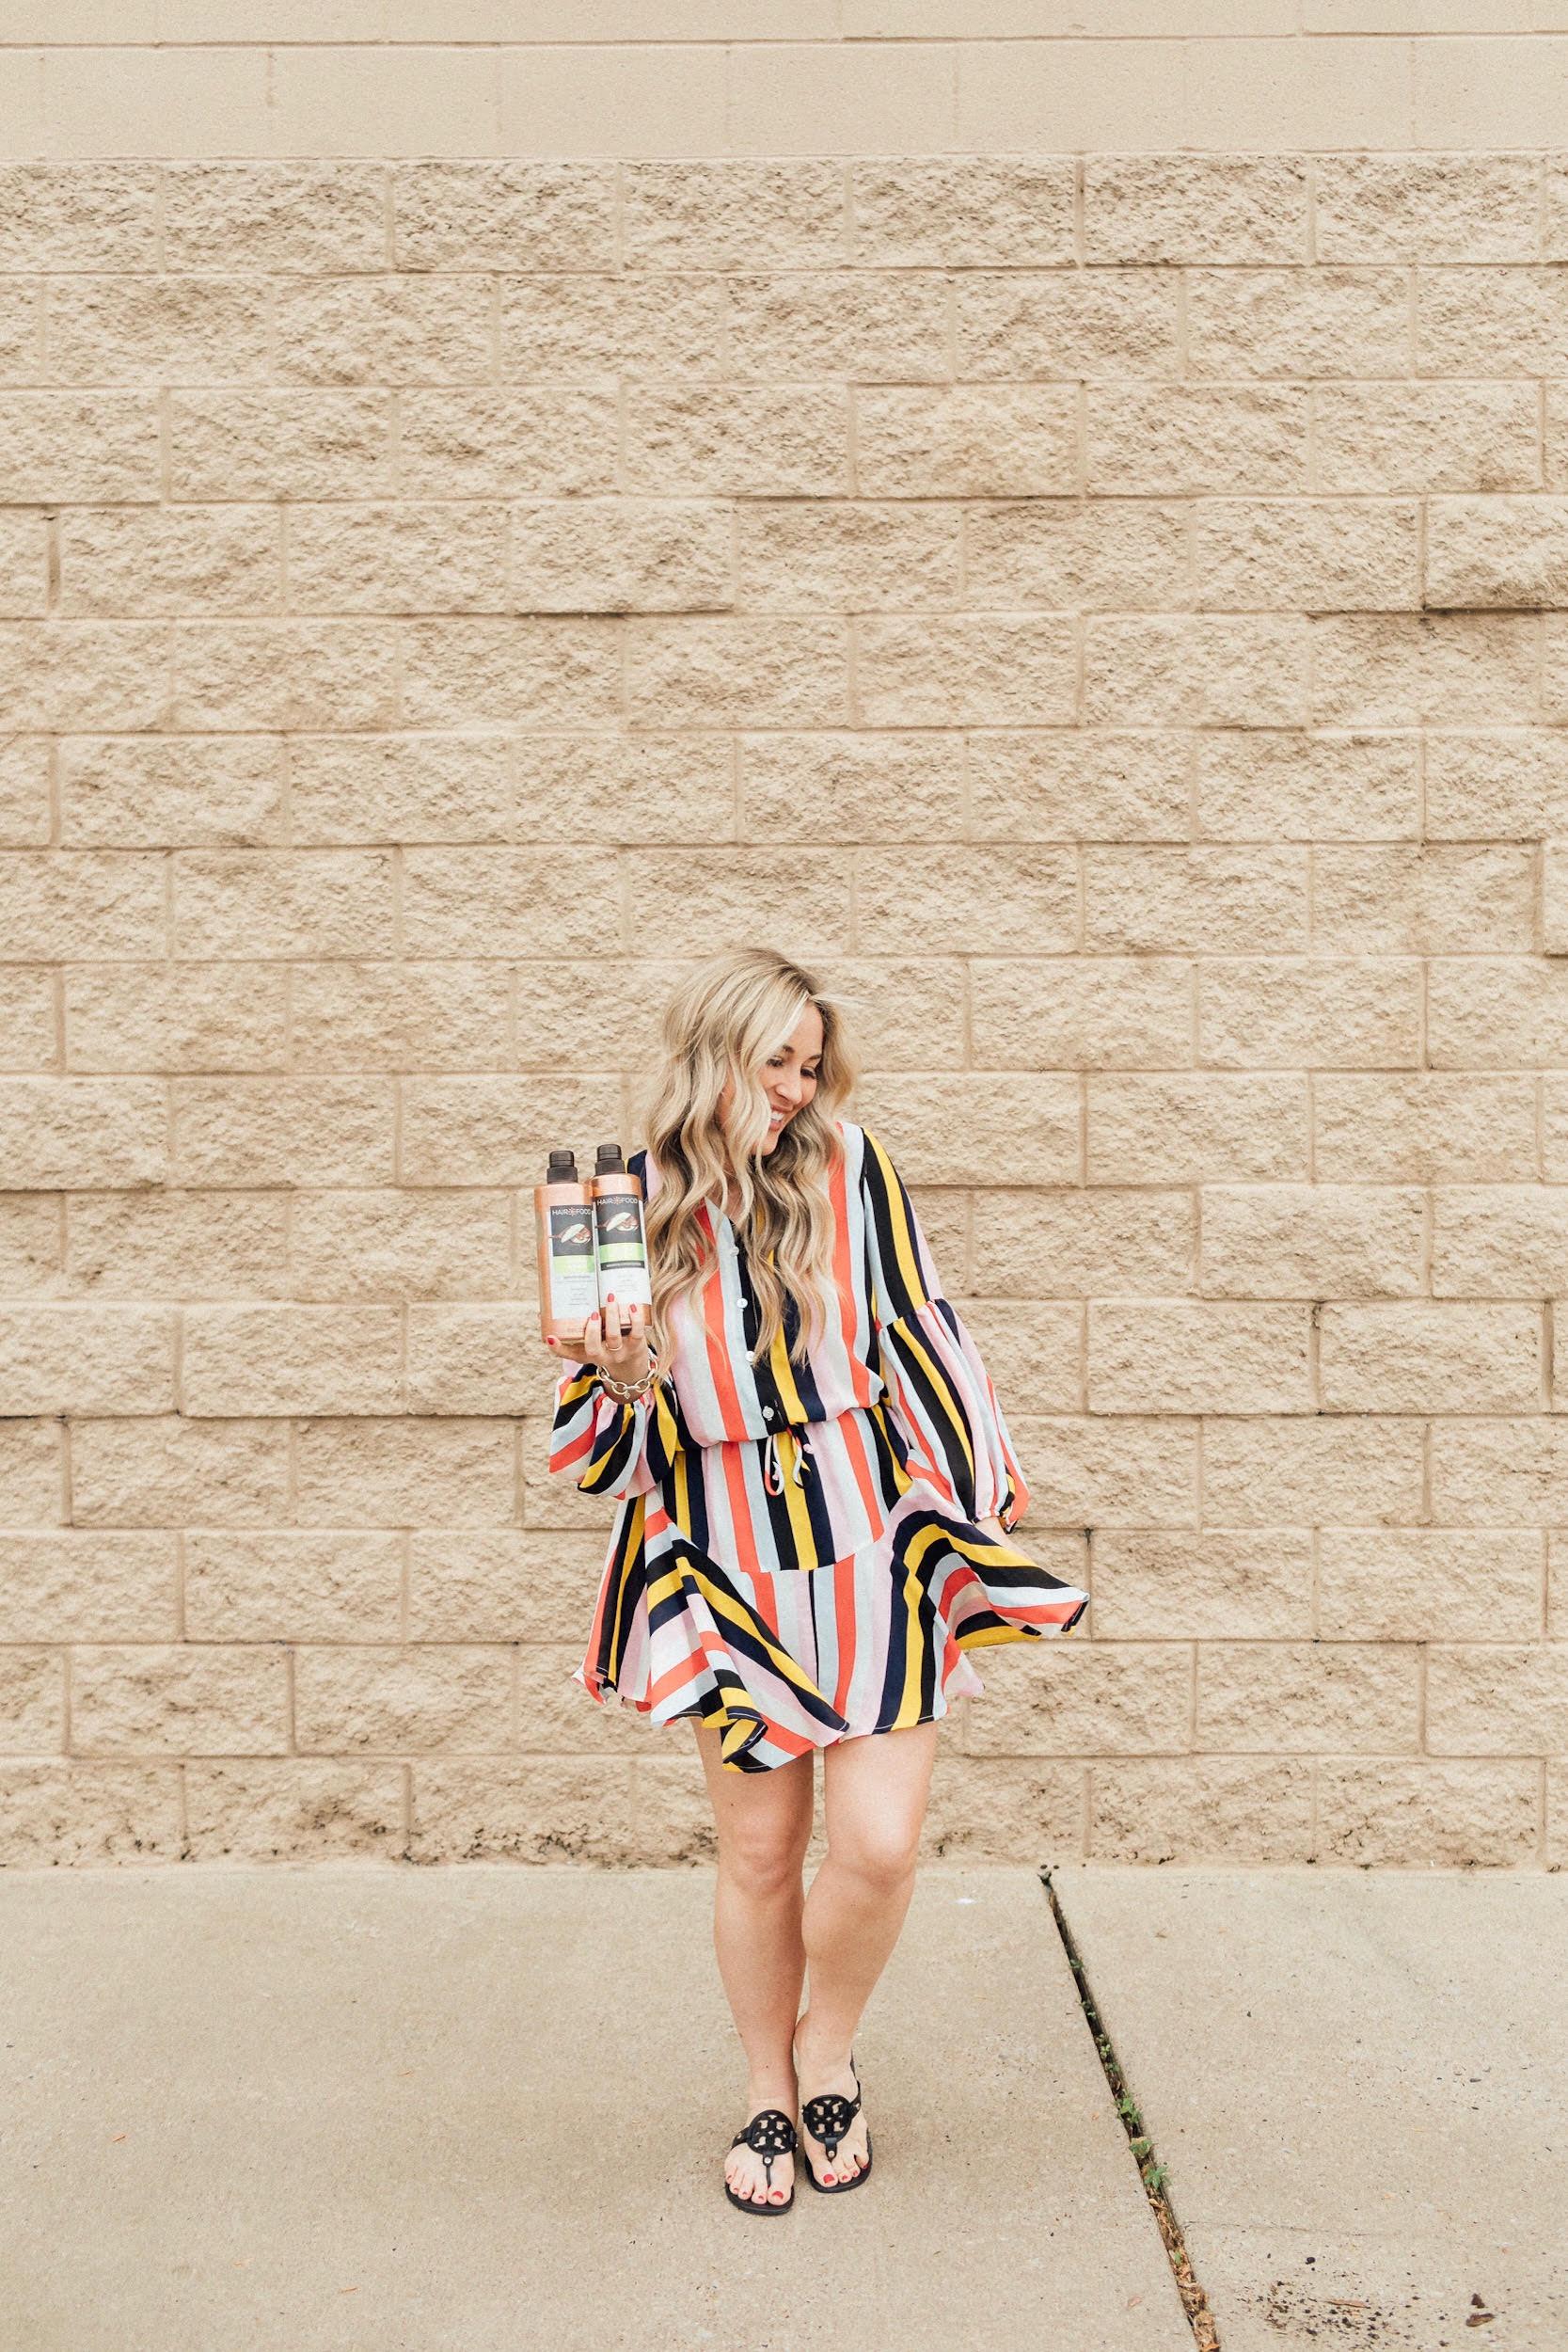 Hair Food products reviewed by top US beauty blog, Walking in Memphis in High Heels